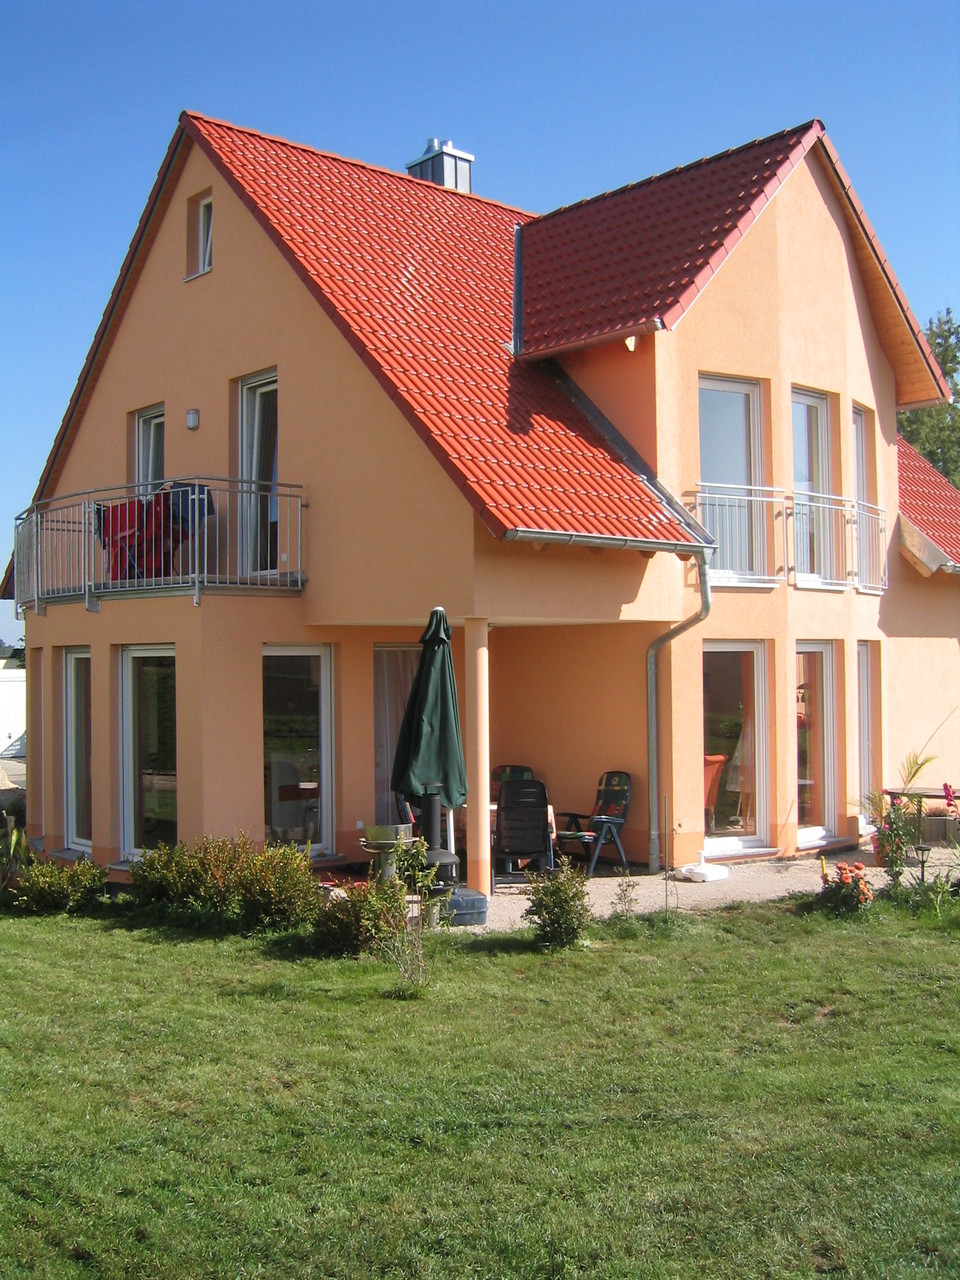 Projekt: Neubau Einfamilienhaus